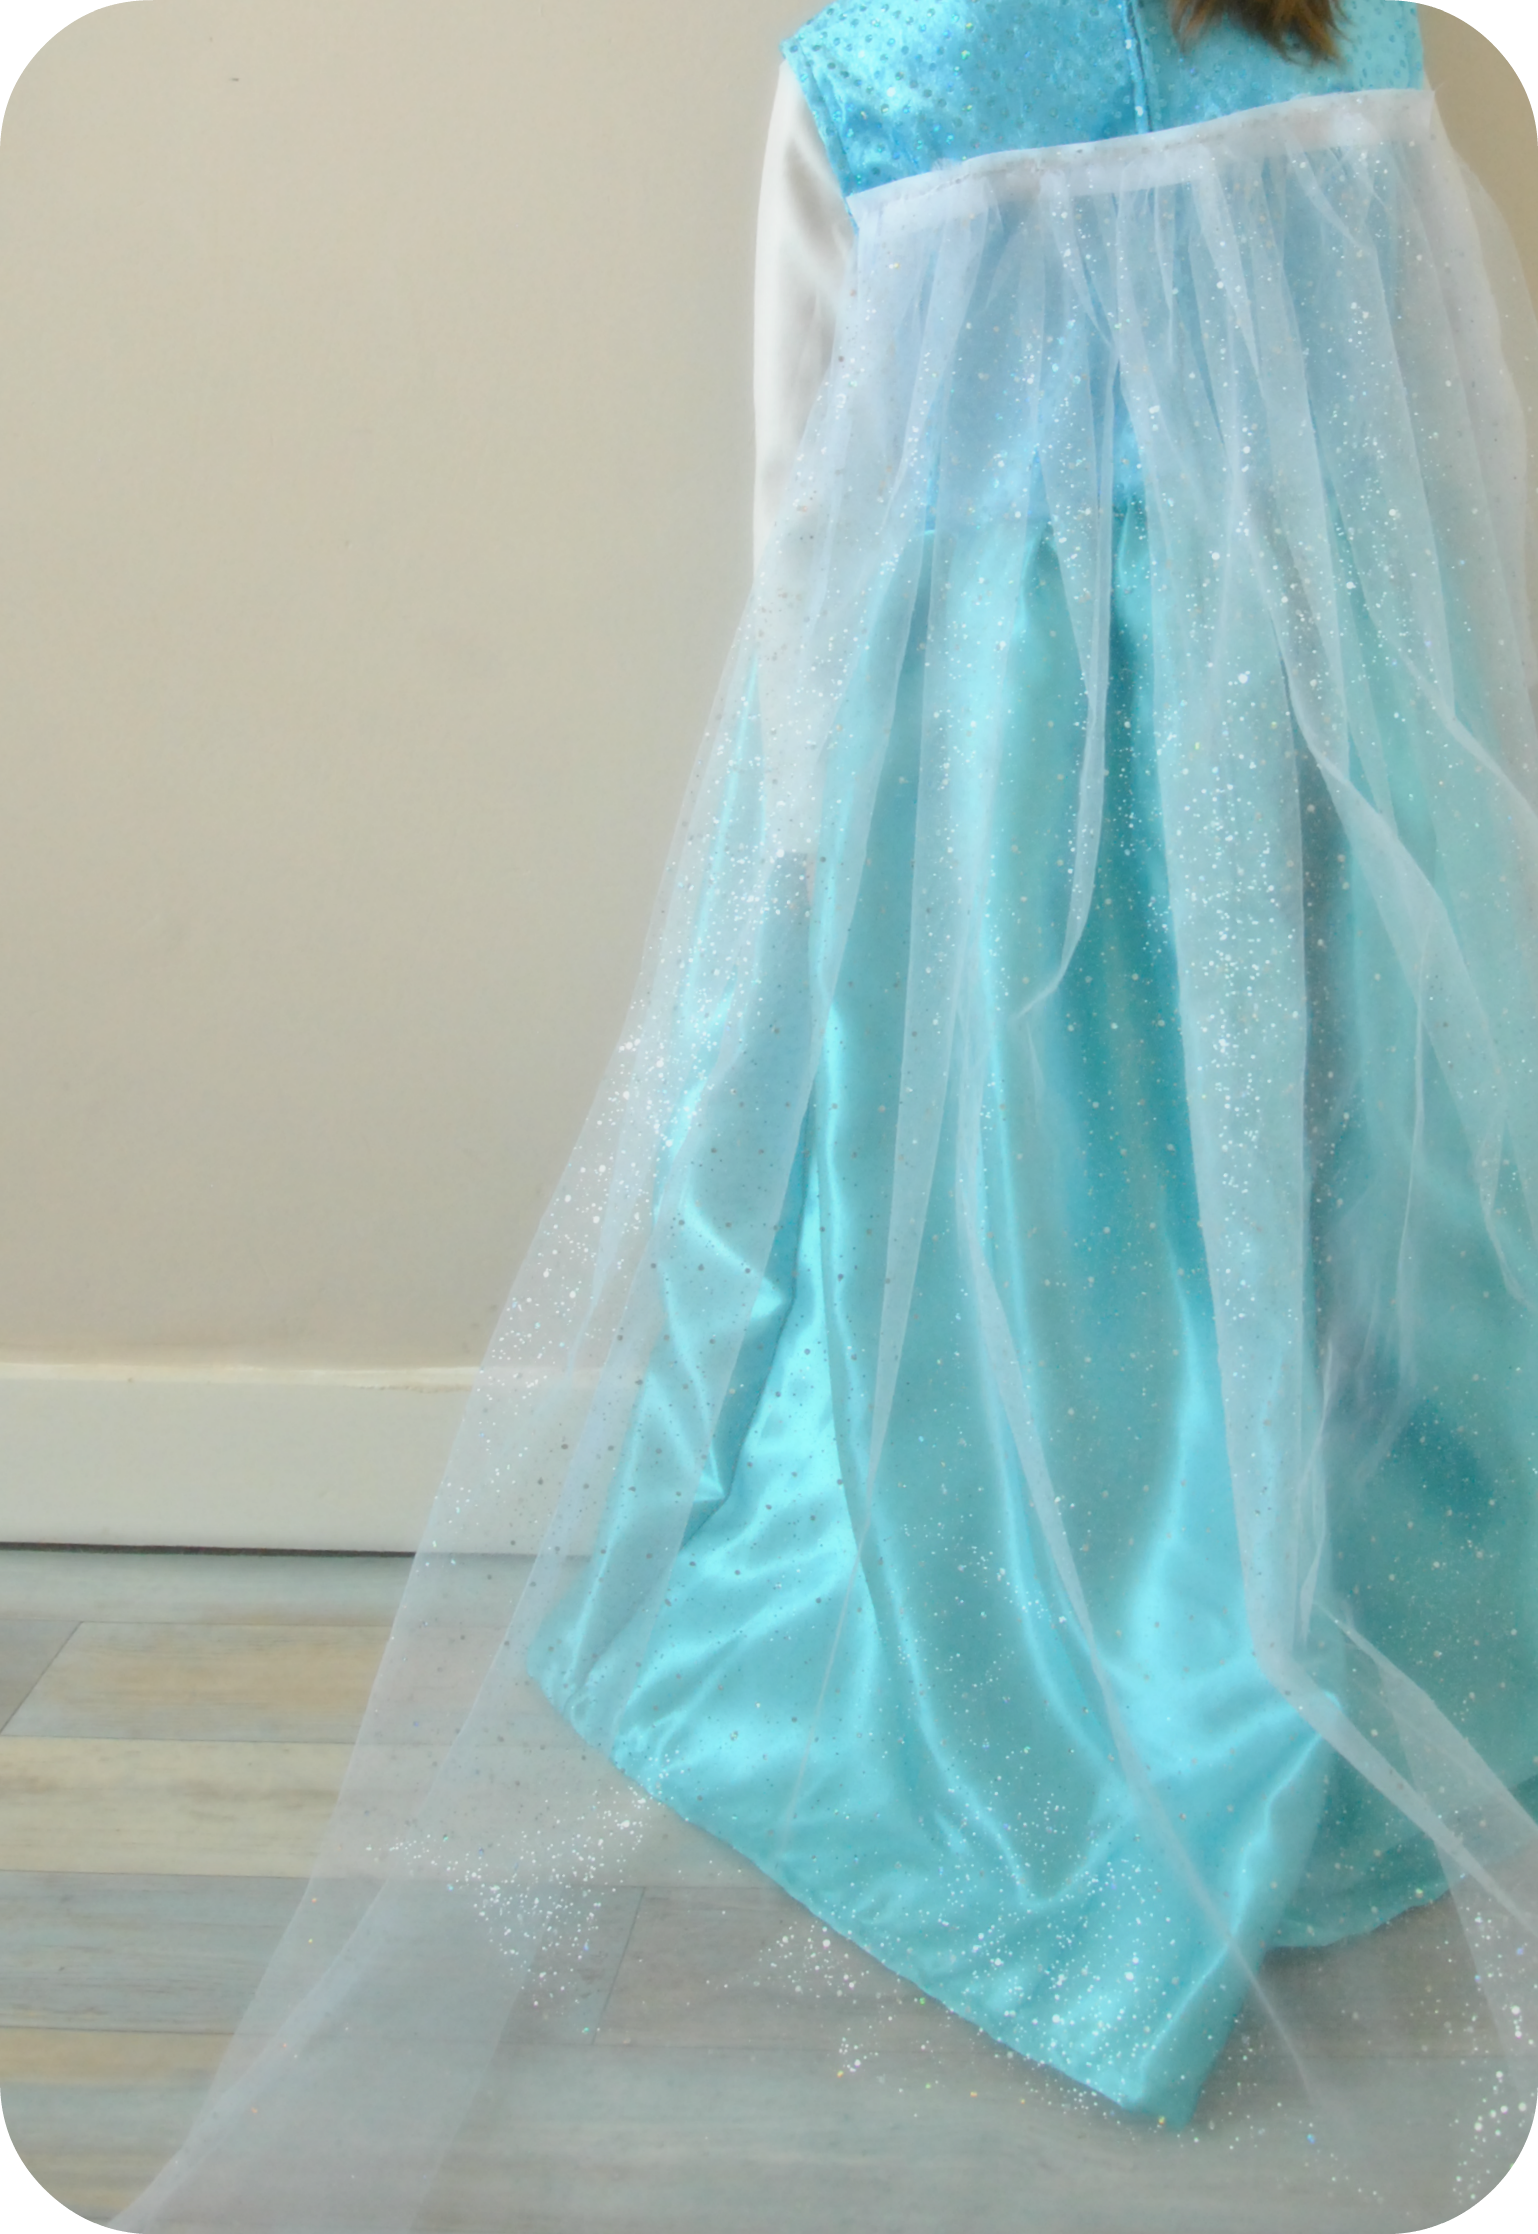 Couture enfant mademoiselle lu - Robe reine des glaces ...